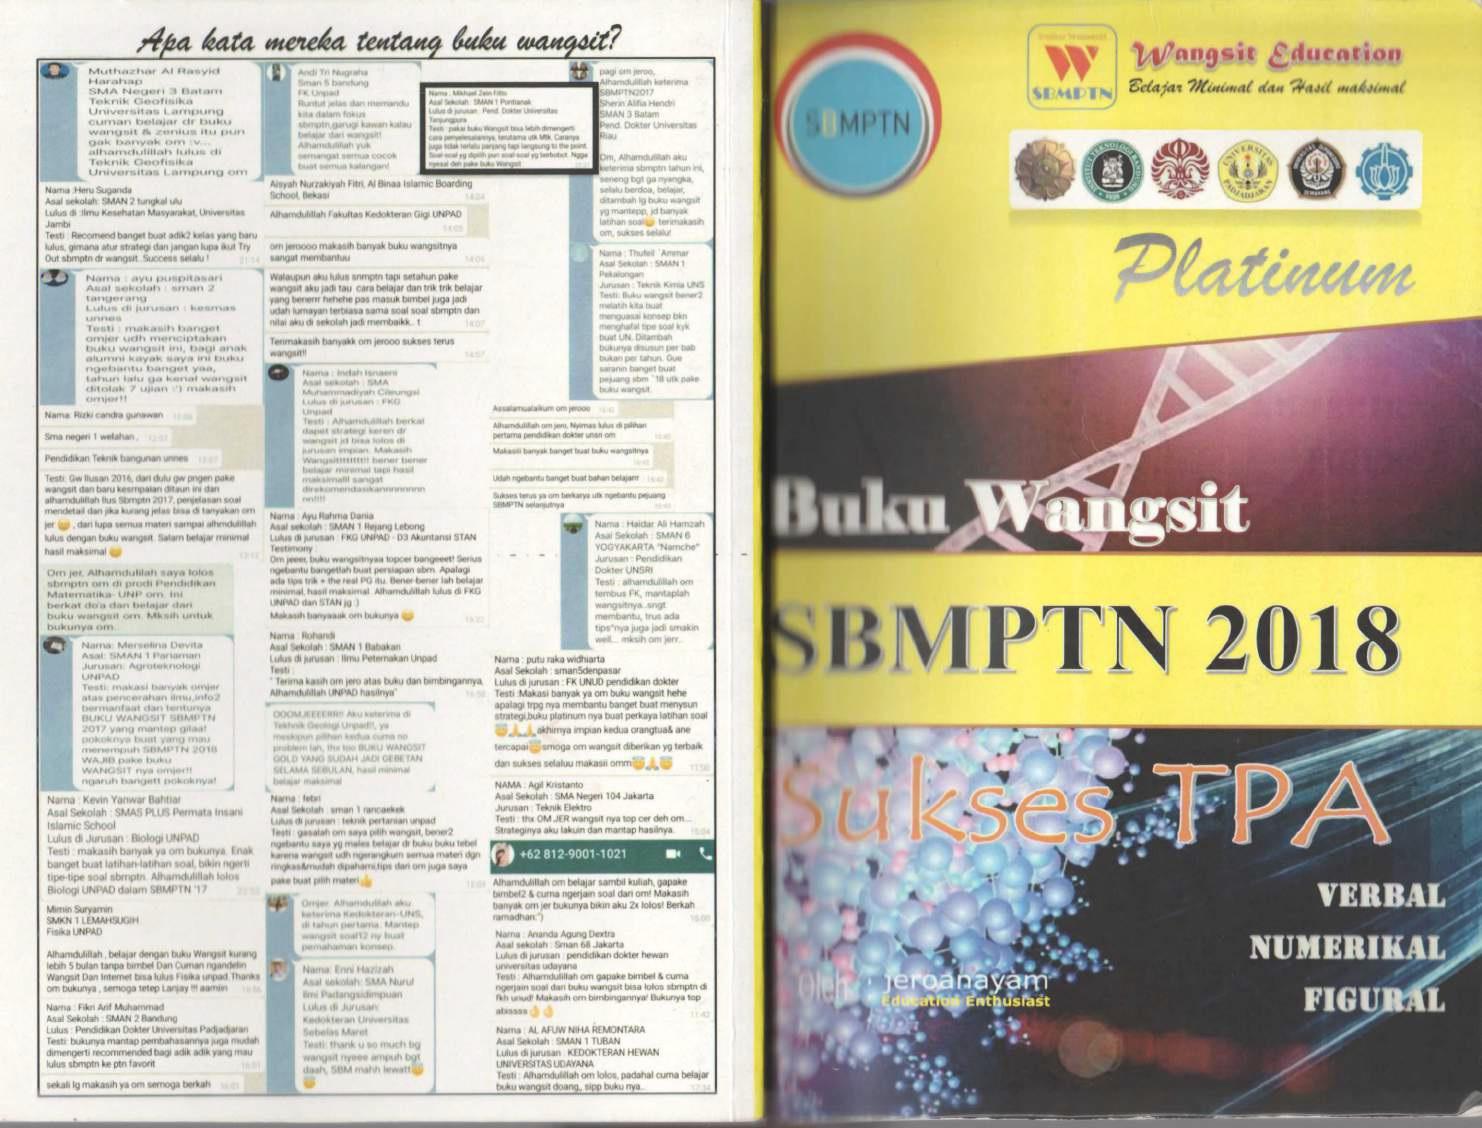 Buku Wangsit SBMPTN 2018 Sukses TPA (Verbal, Numerikal, Figural)